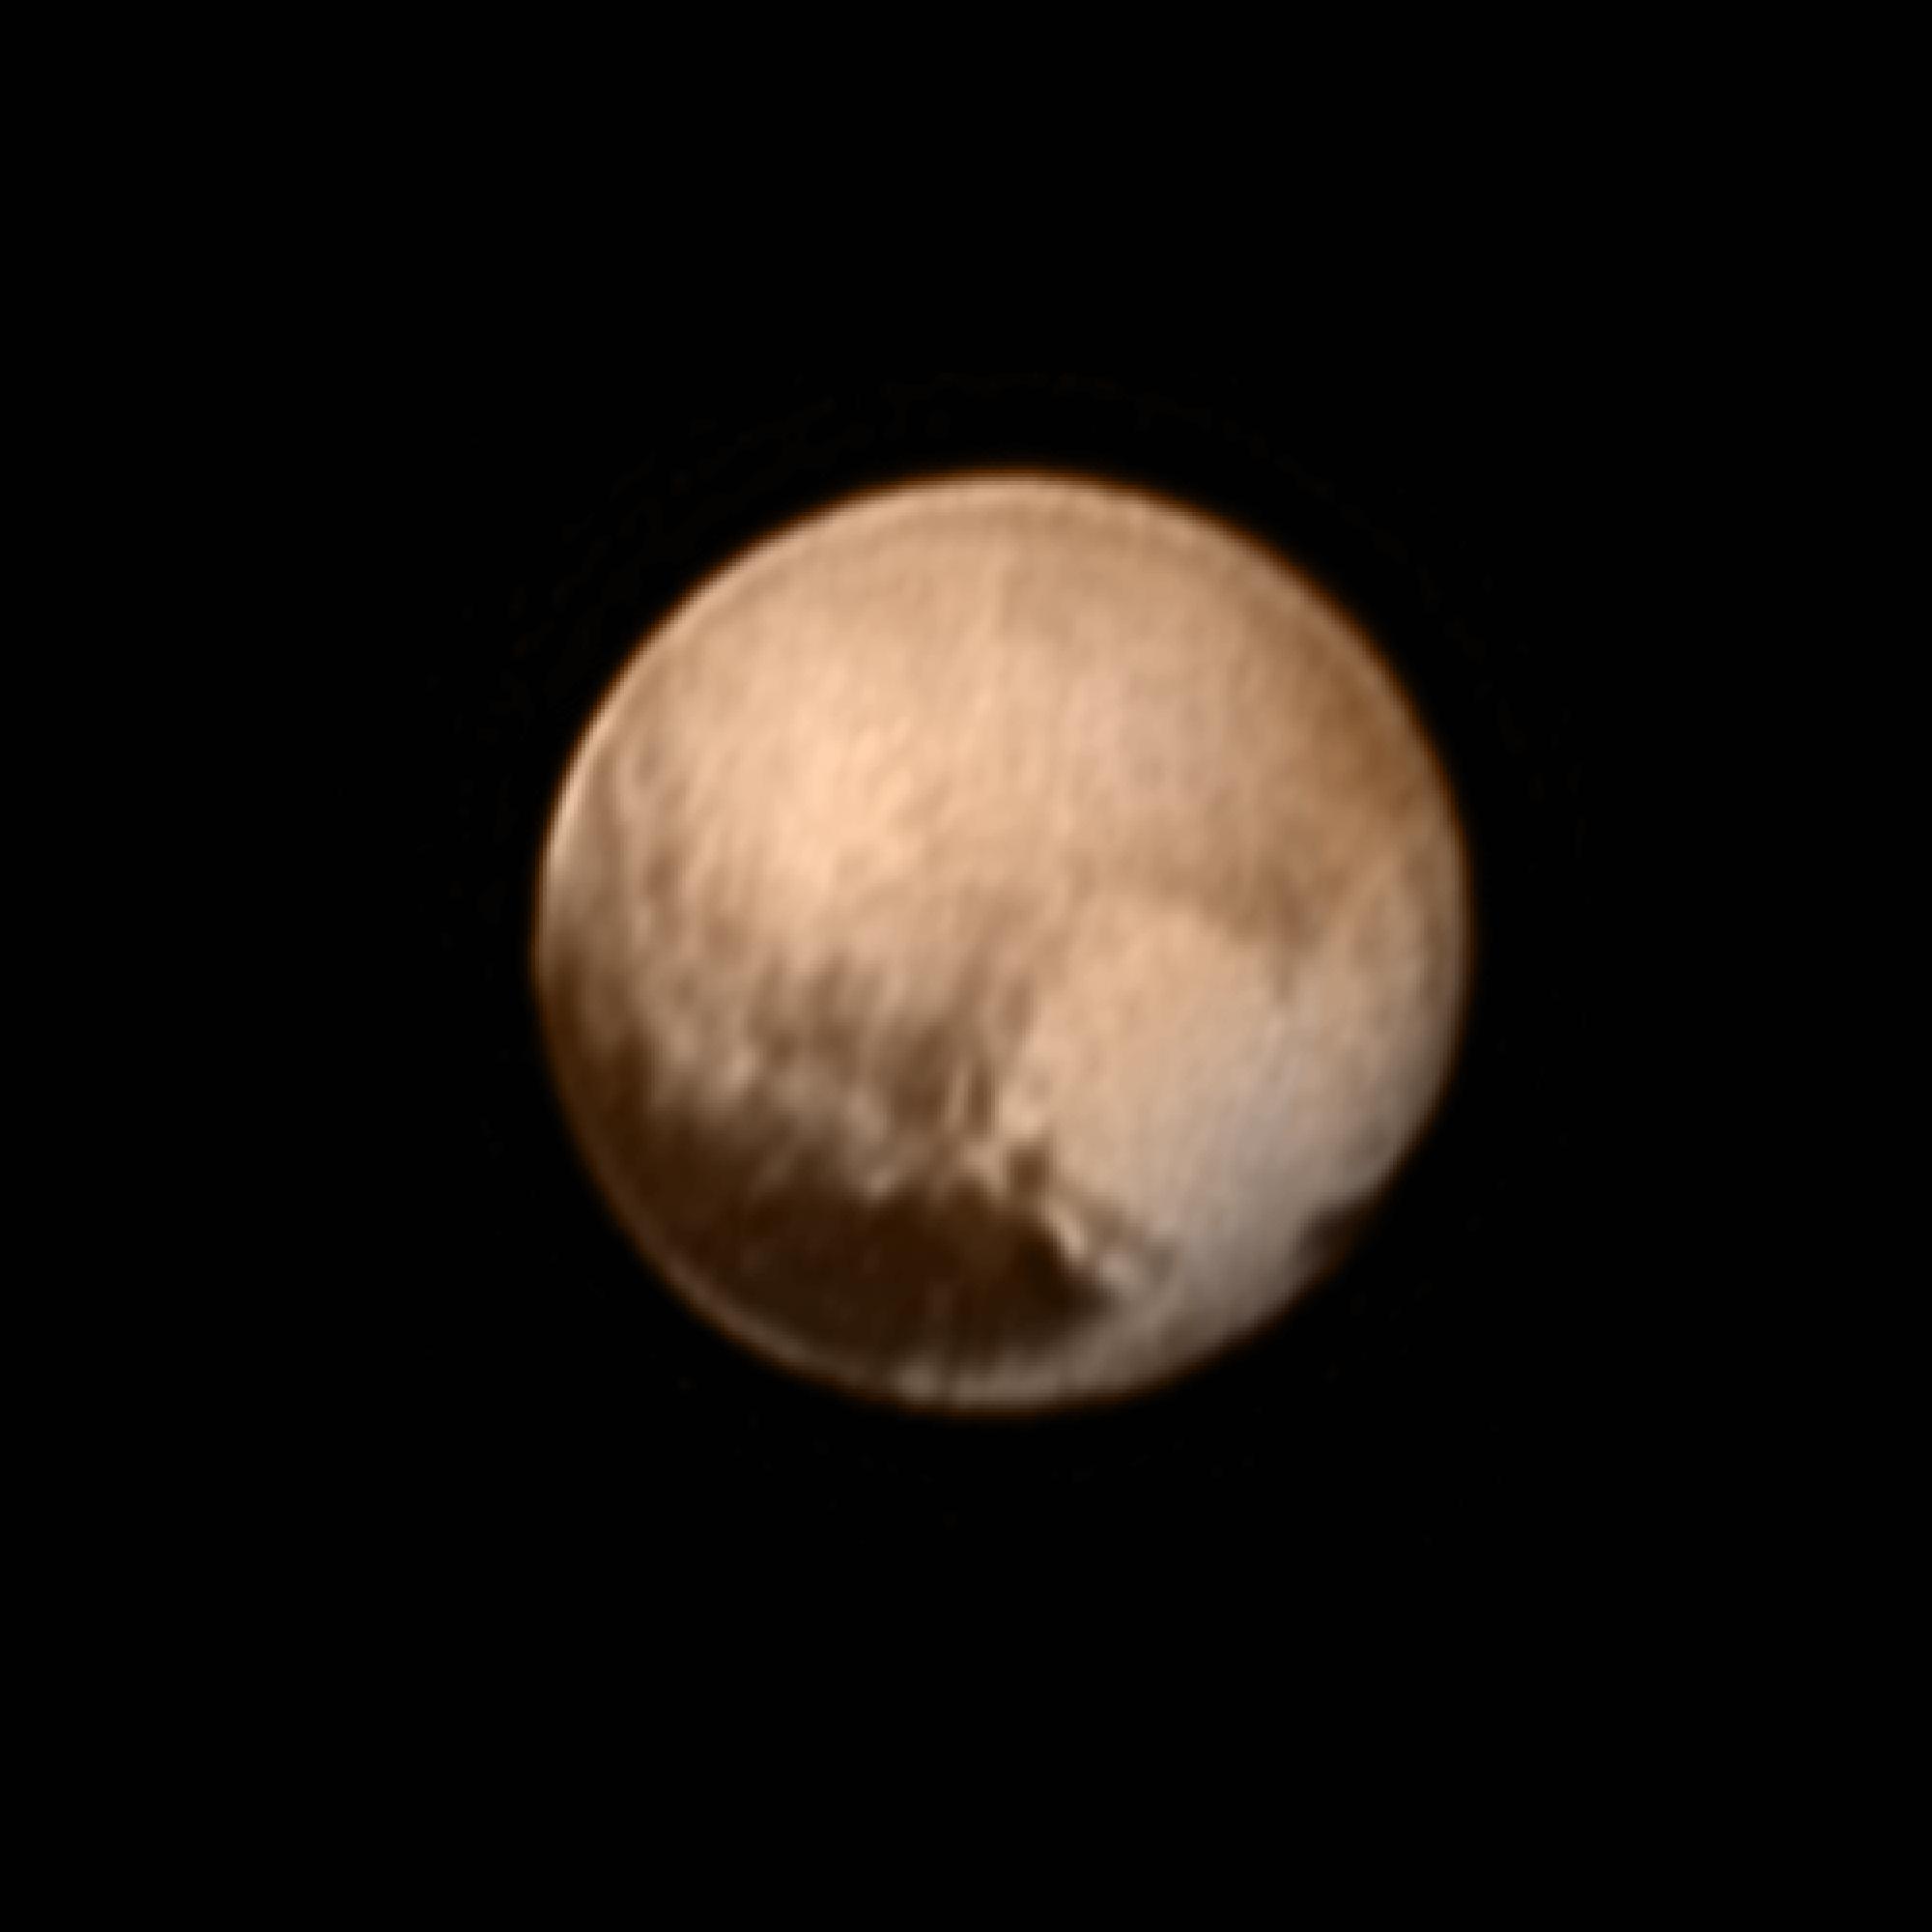 pluto planet size - photo #35